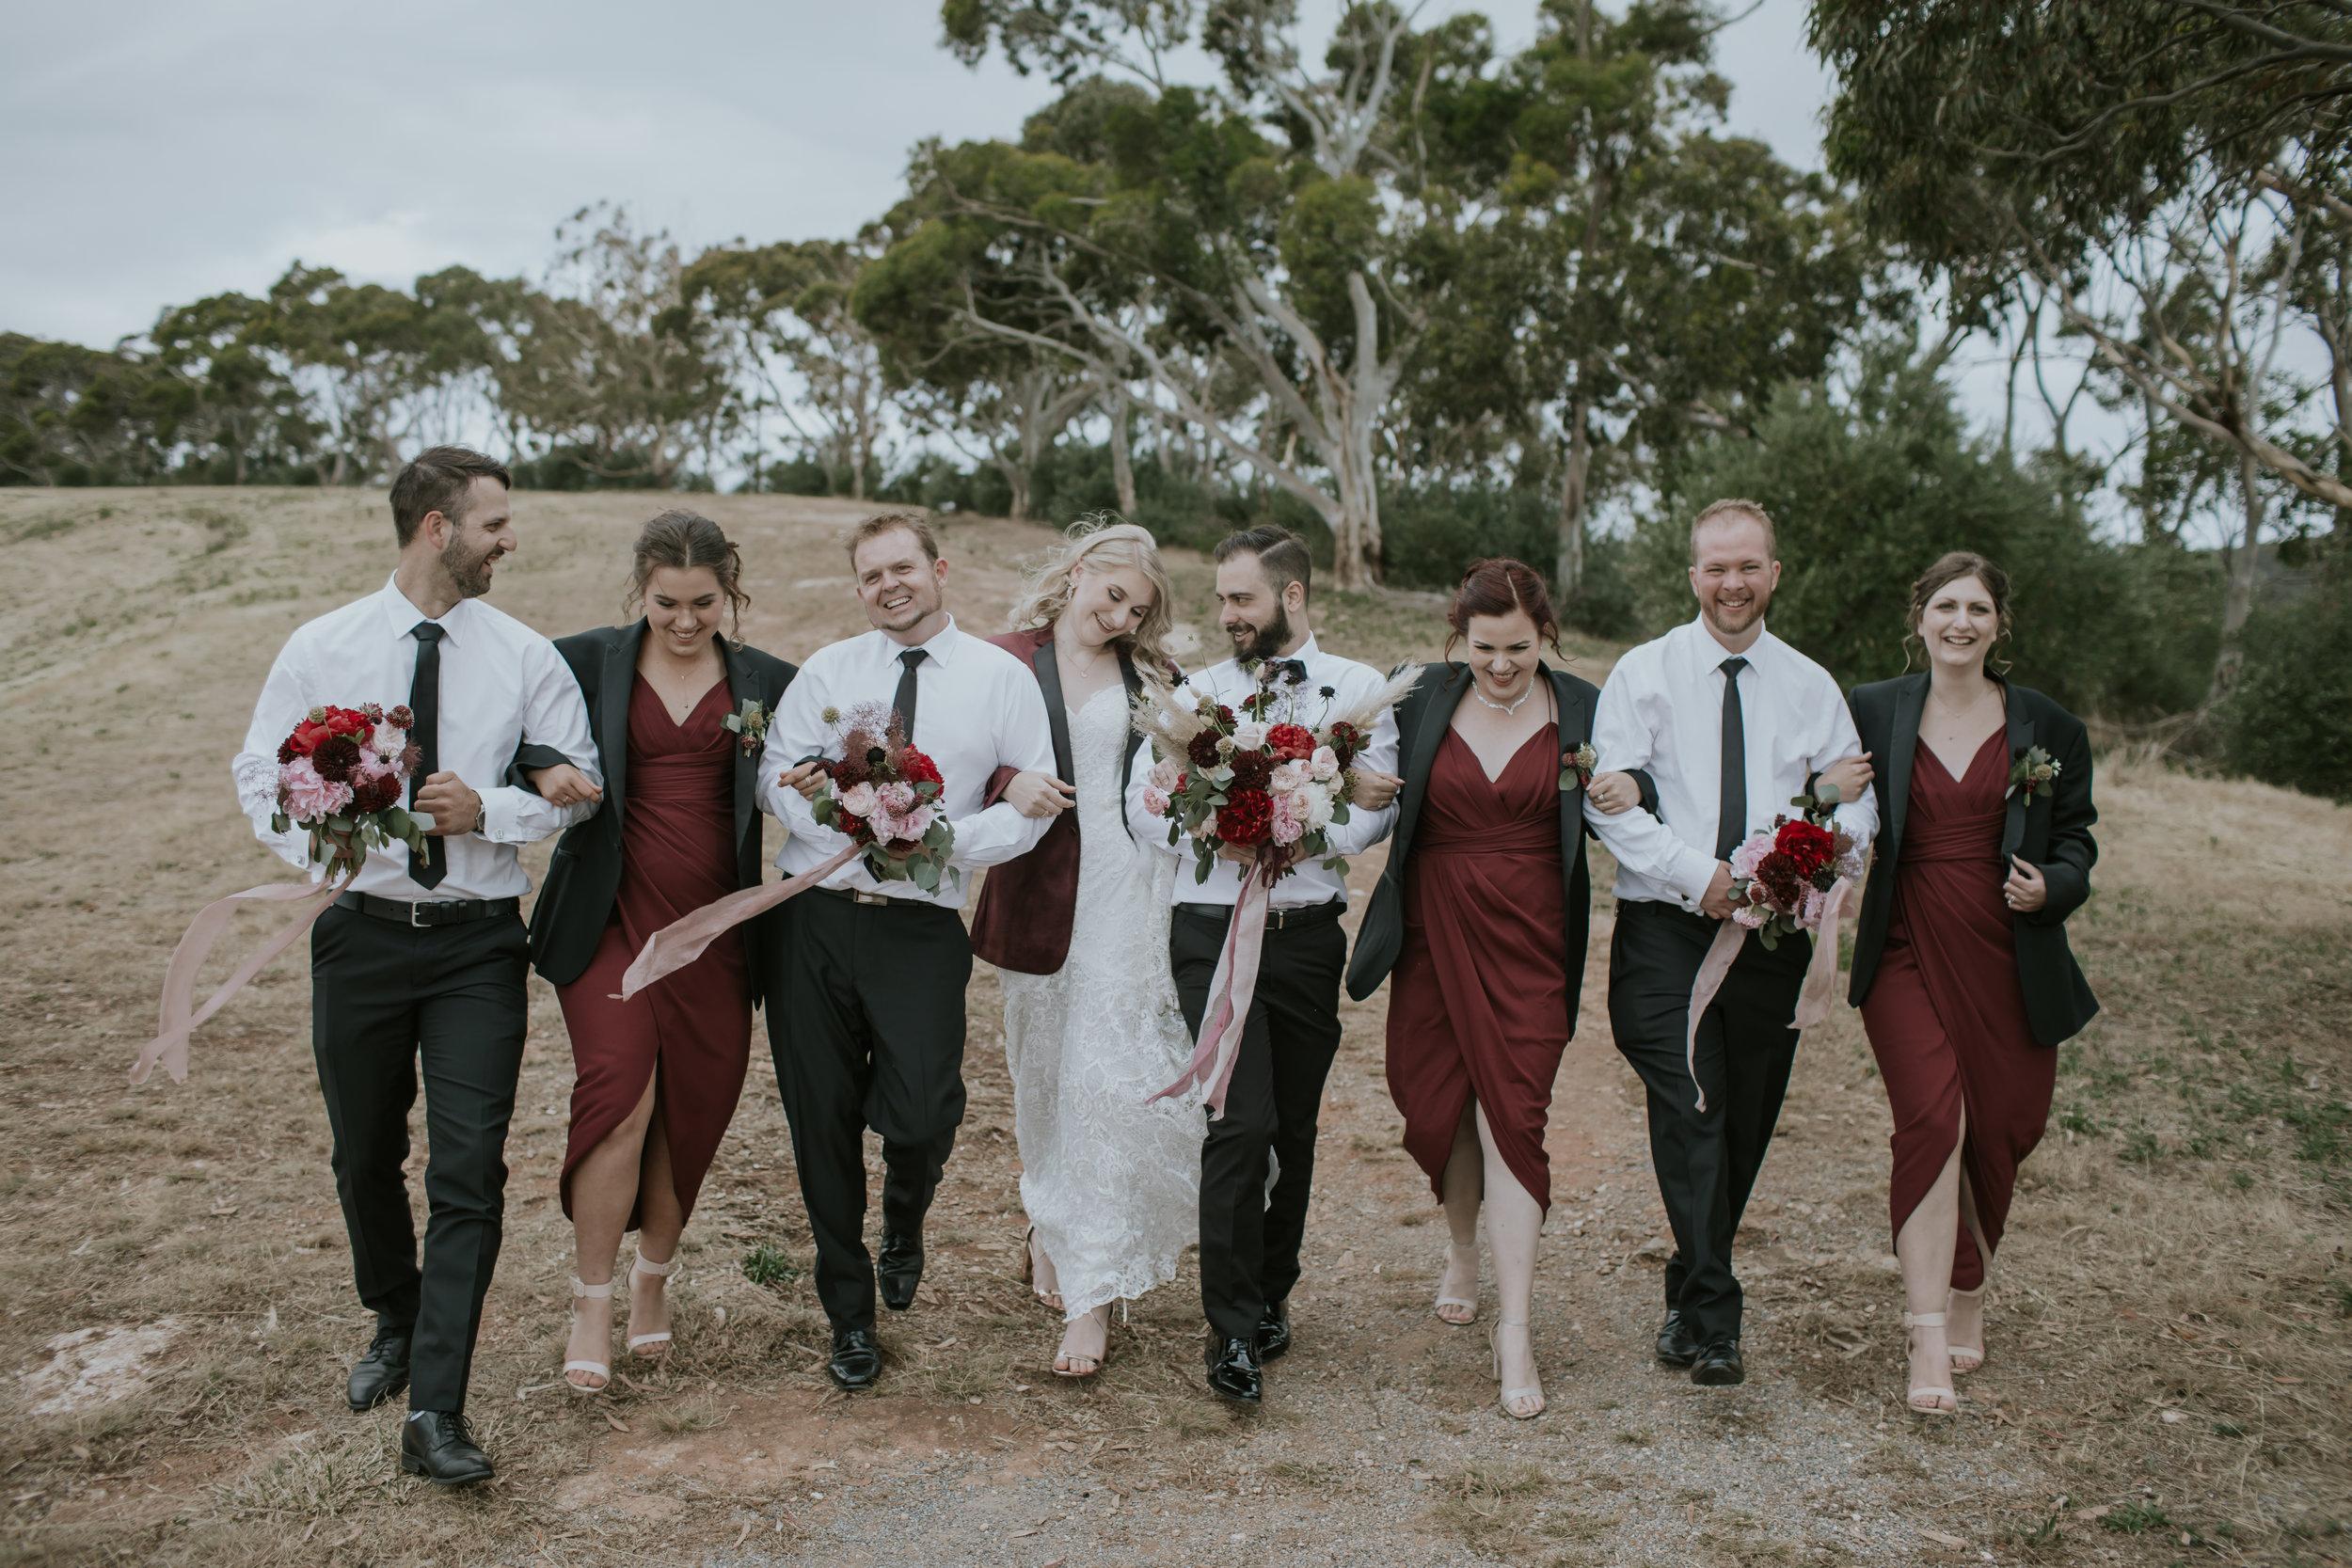 W.Travis-Benny-weddings-wedding-photographer-adelaide-Alia-Levi-1-658.jpg